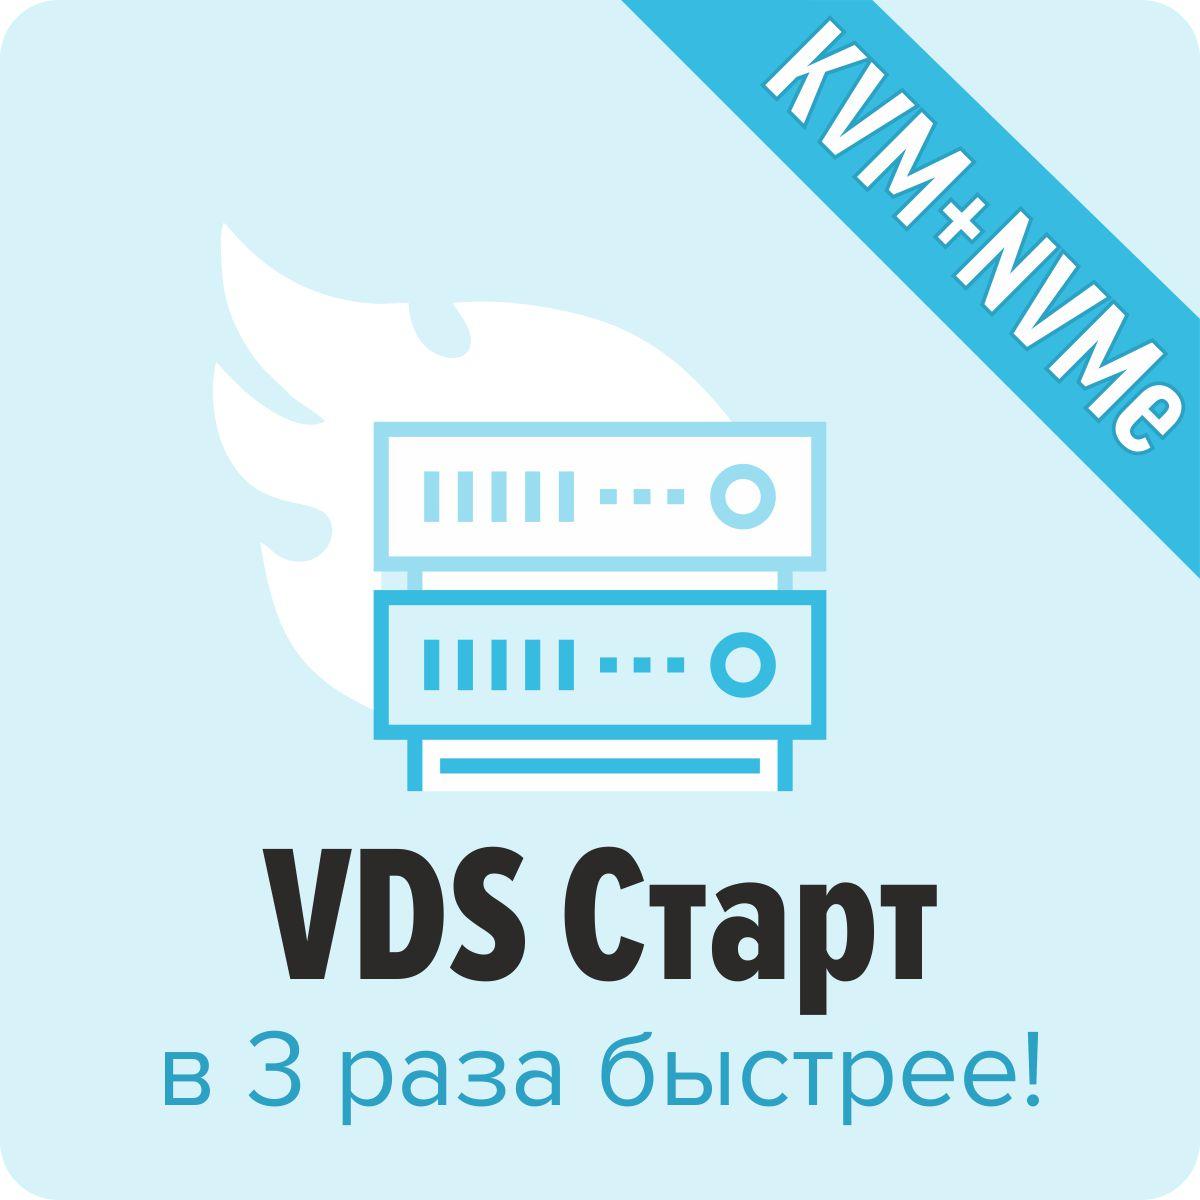 VDS Старт (KVM, NVMe, 1 Core, 1Gb RAM, 20Gb NVMe)